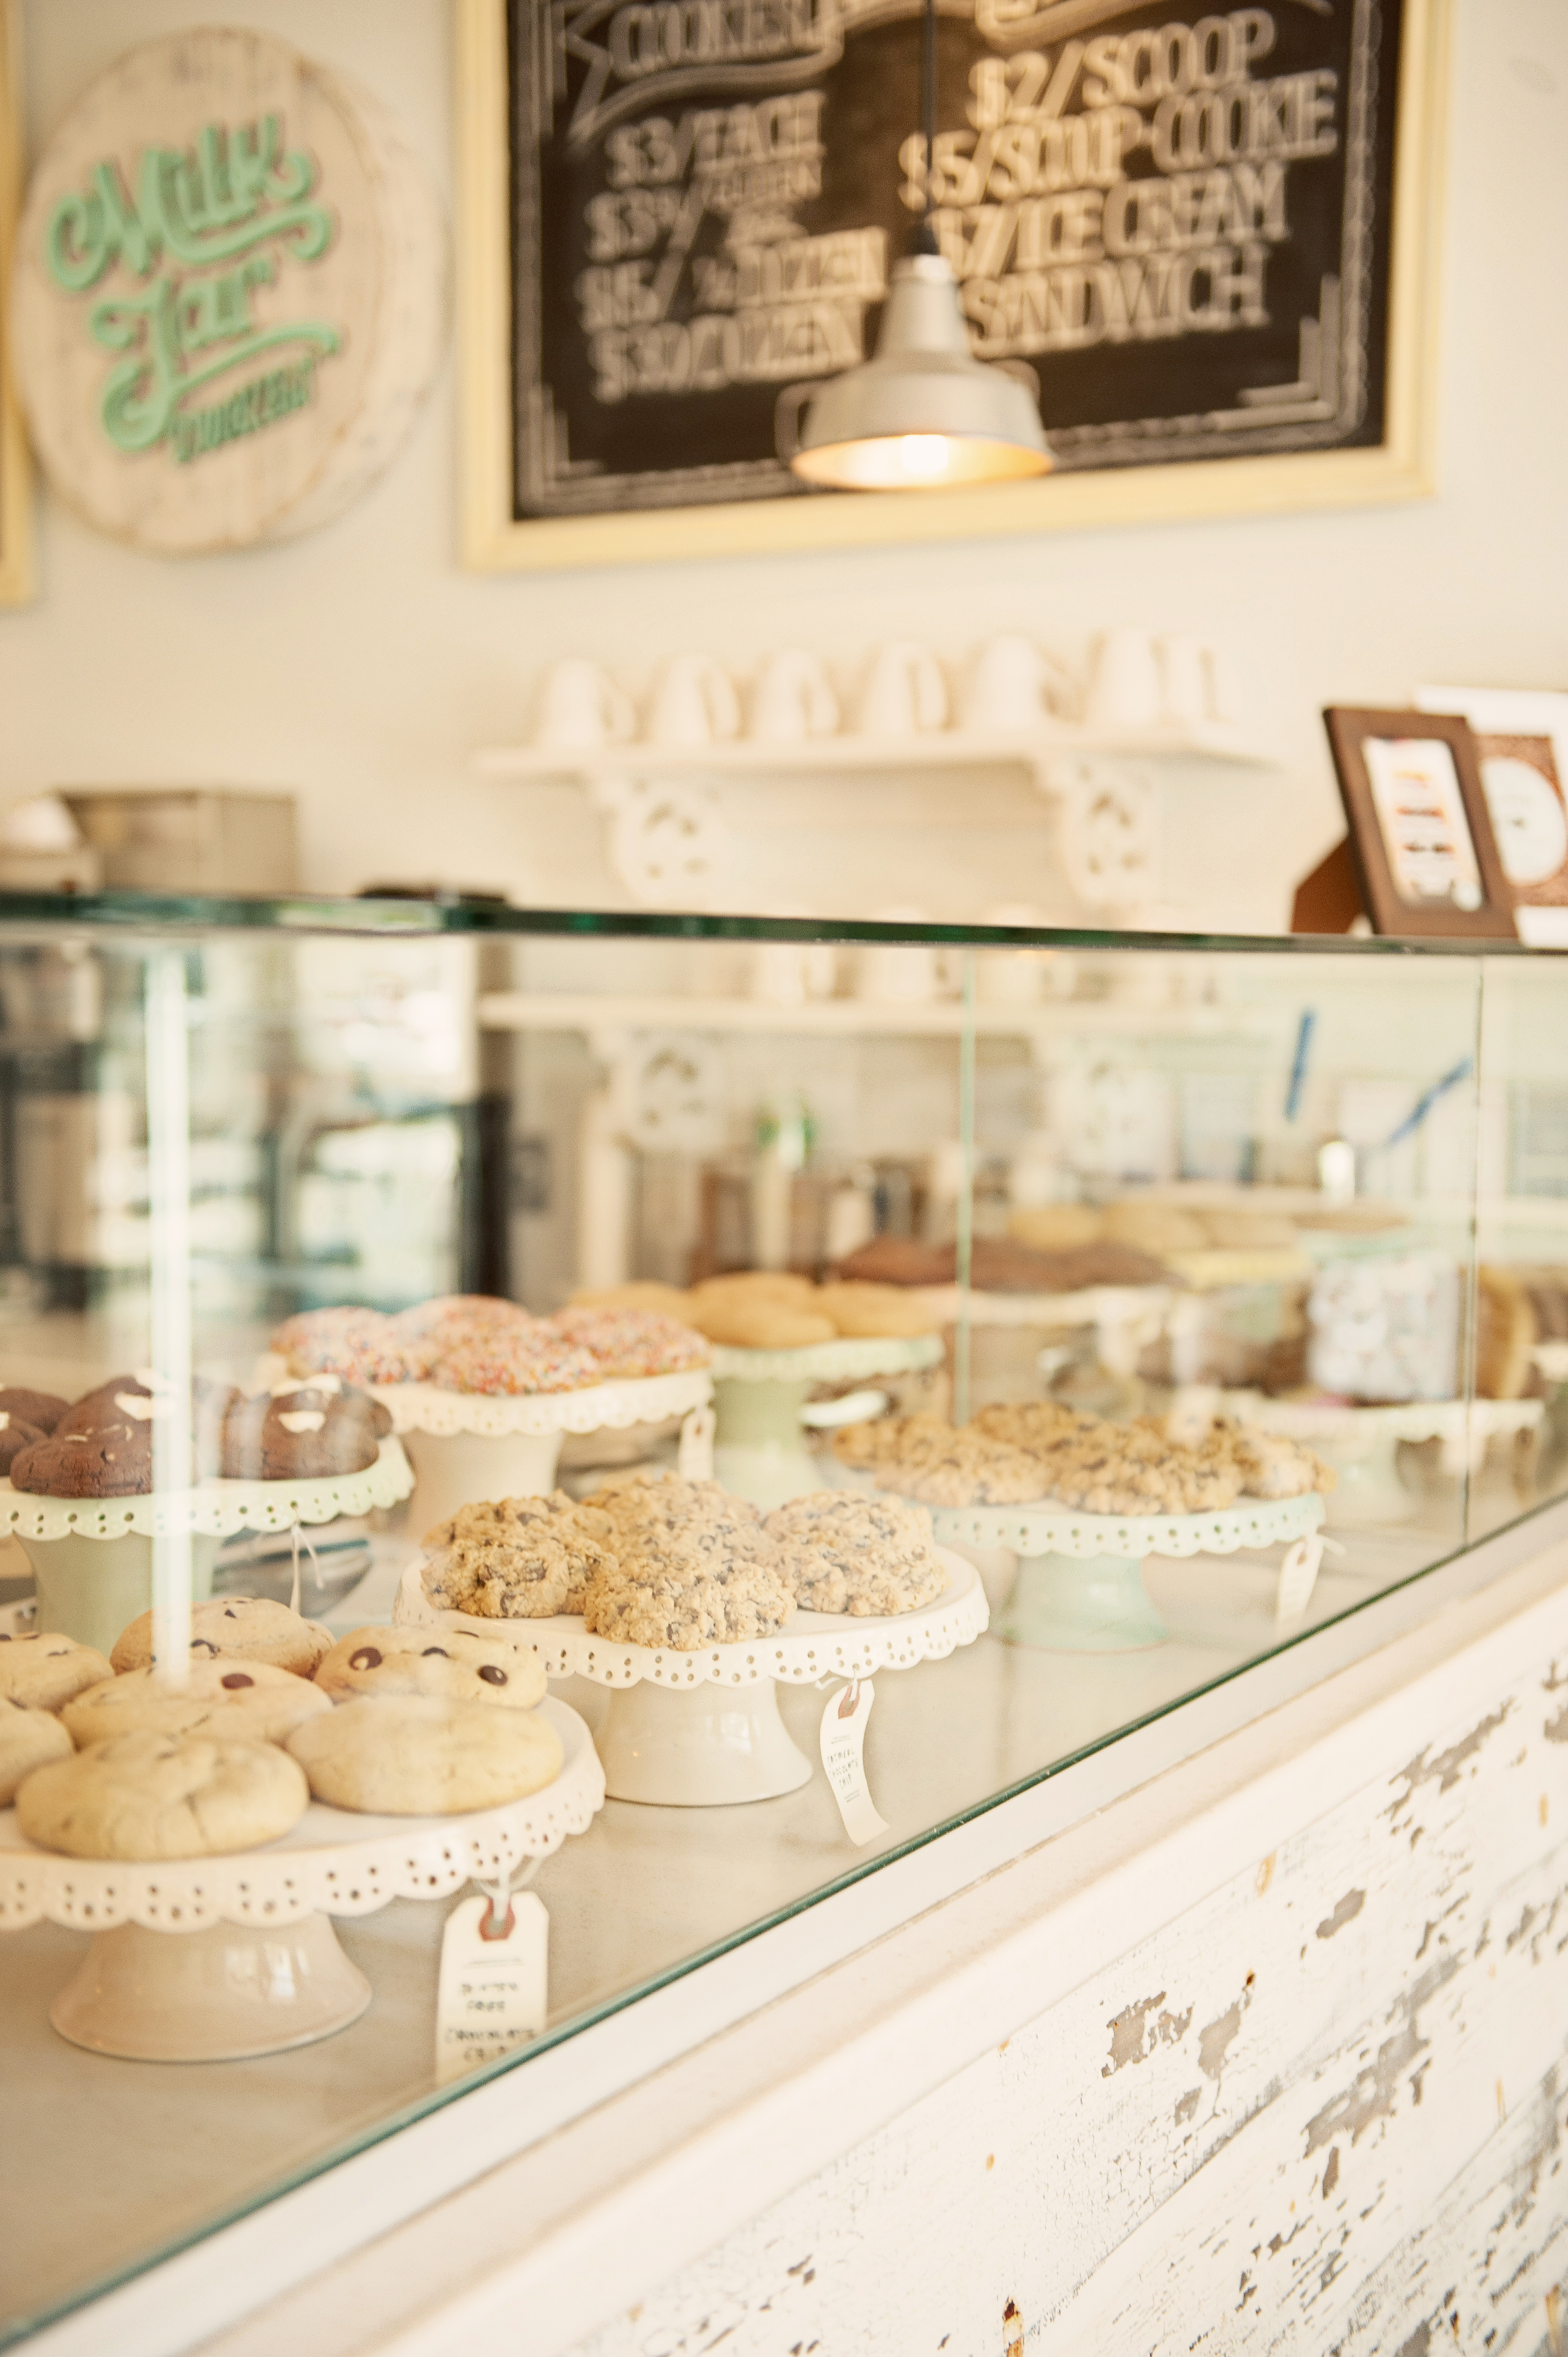 Milk Jar Cookies Shop